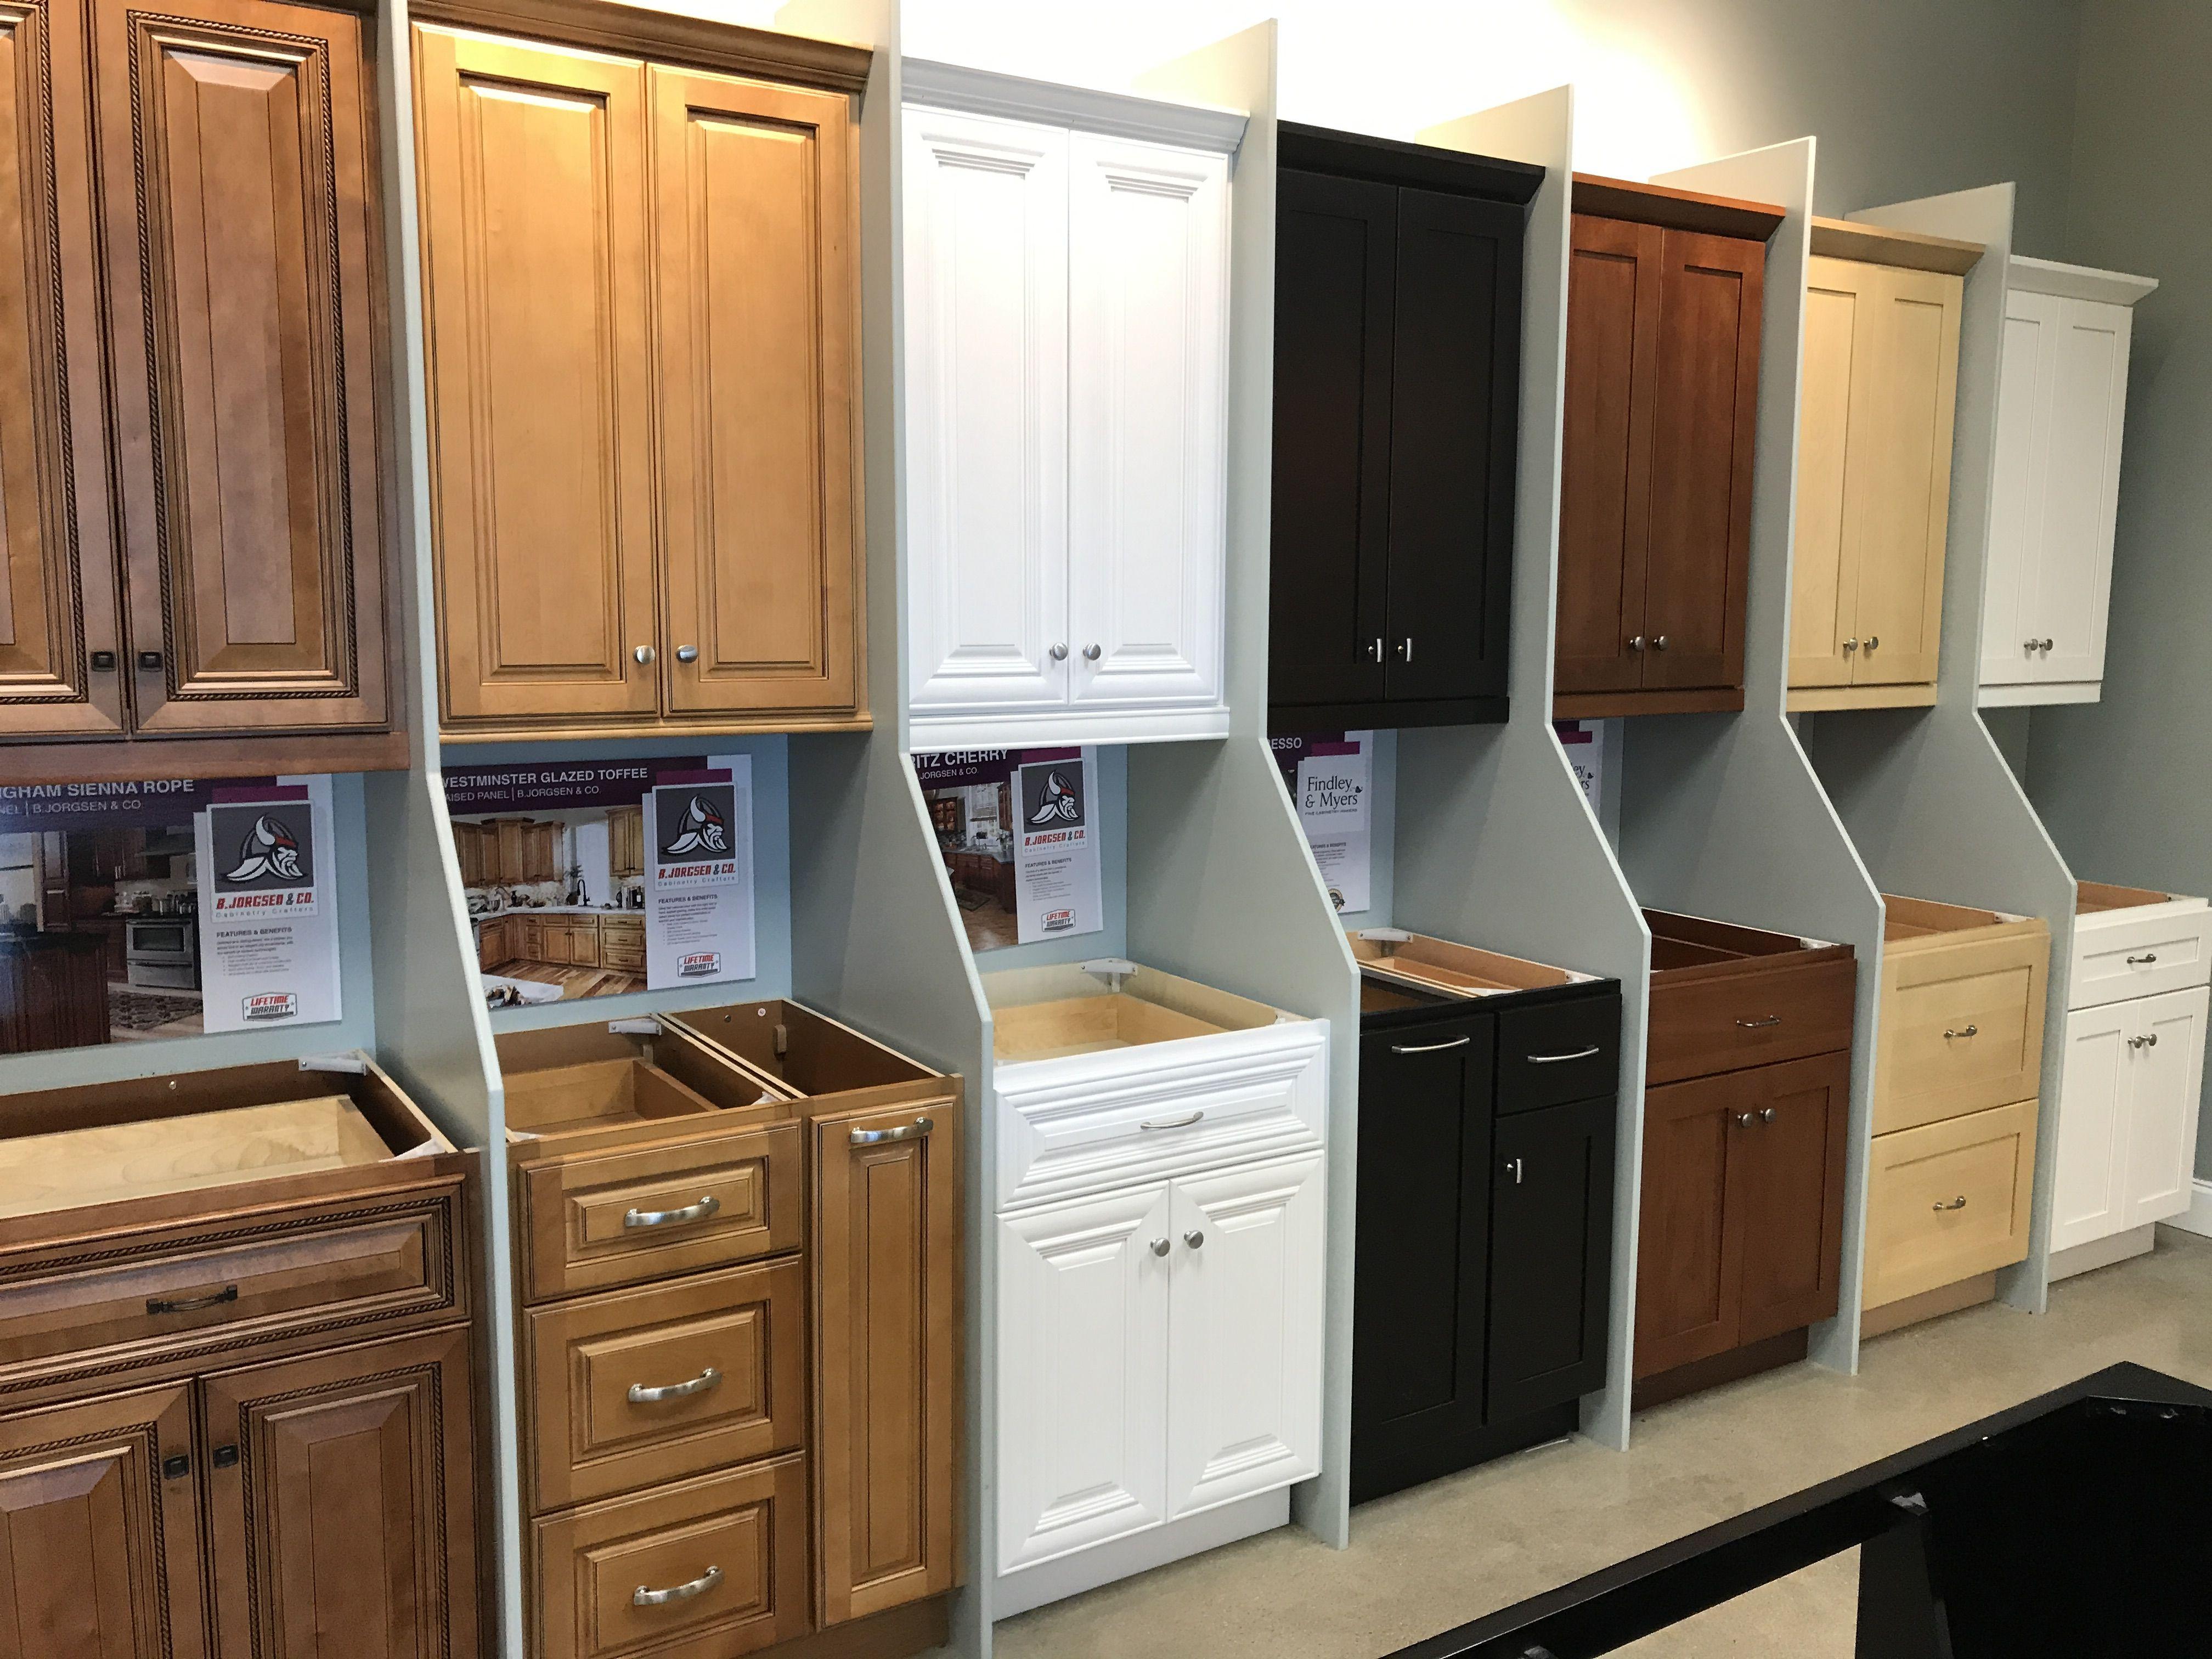 Premium Bathroom And Kitchen Cabinets In Plano Tx Quality Kitchen Cabinets Kitchen Cabinets Cabinets To Go